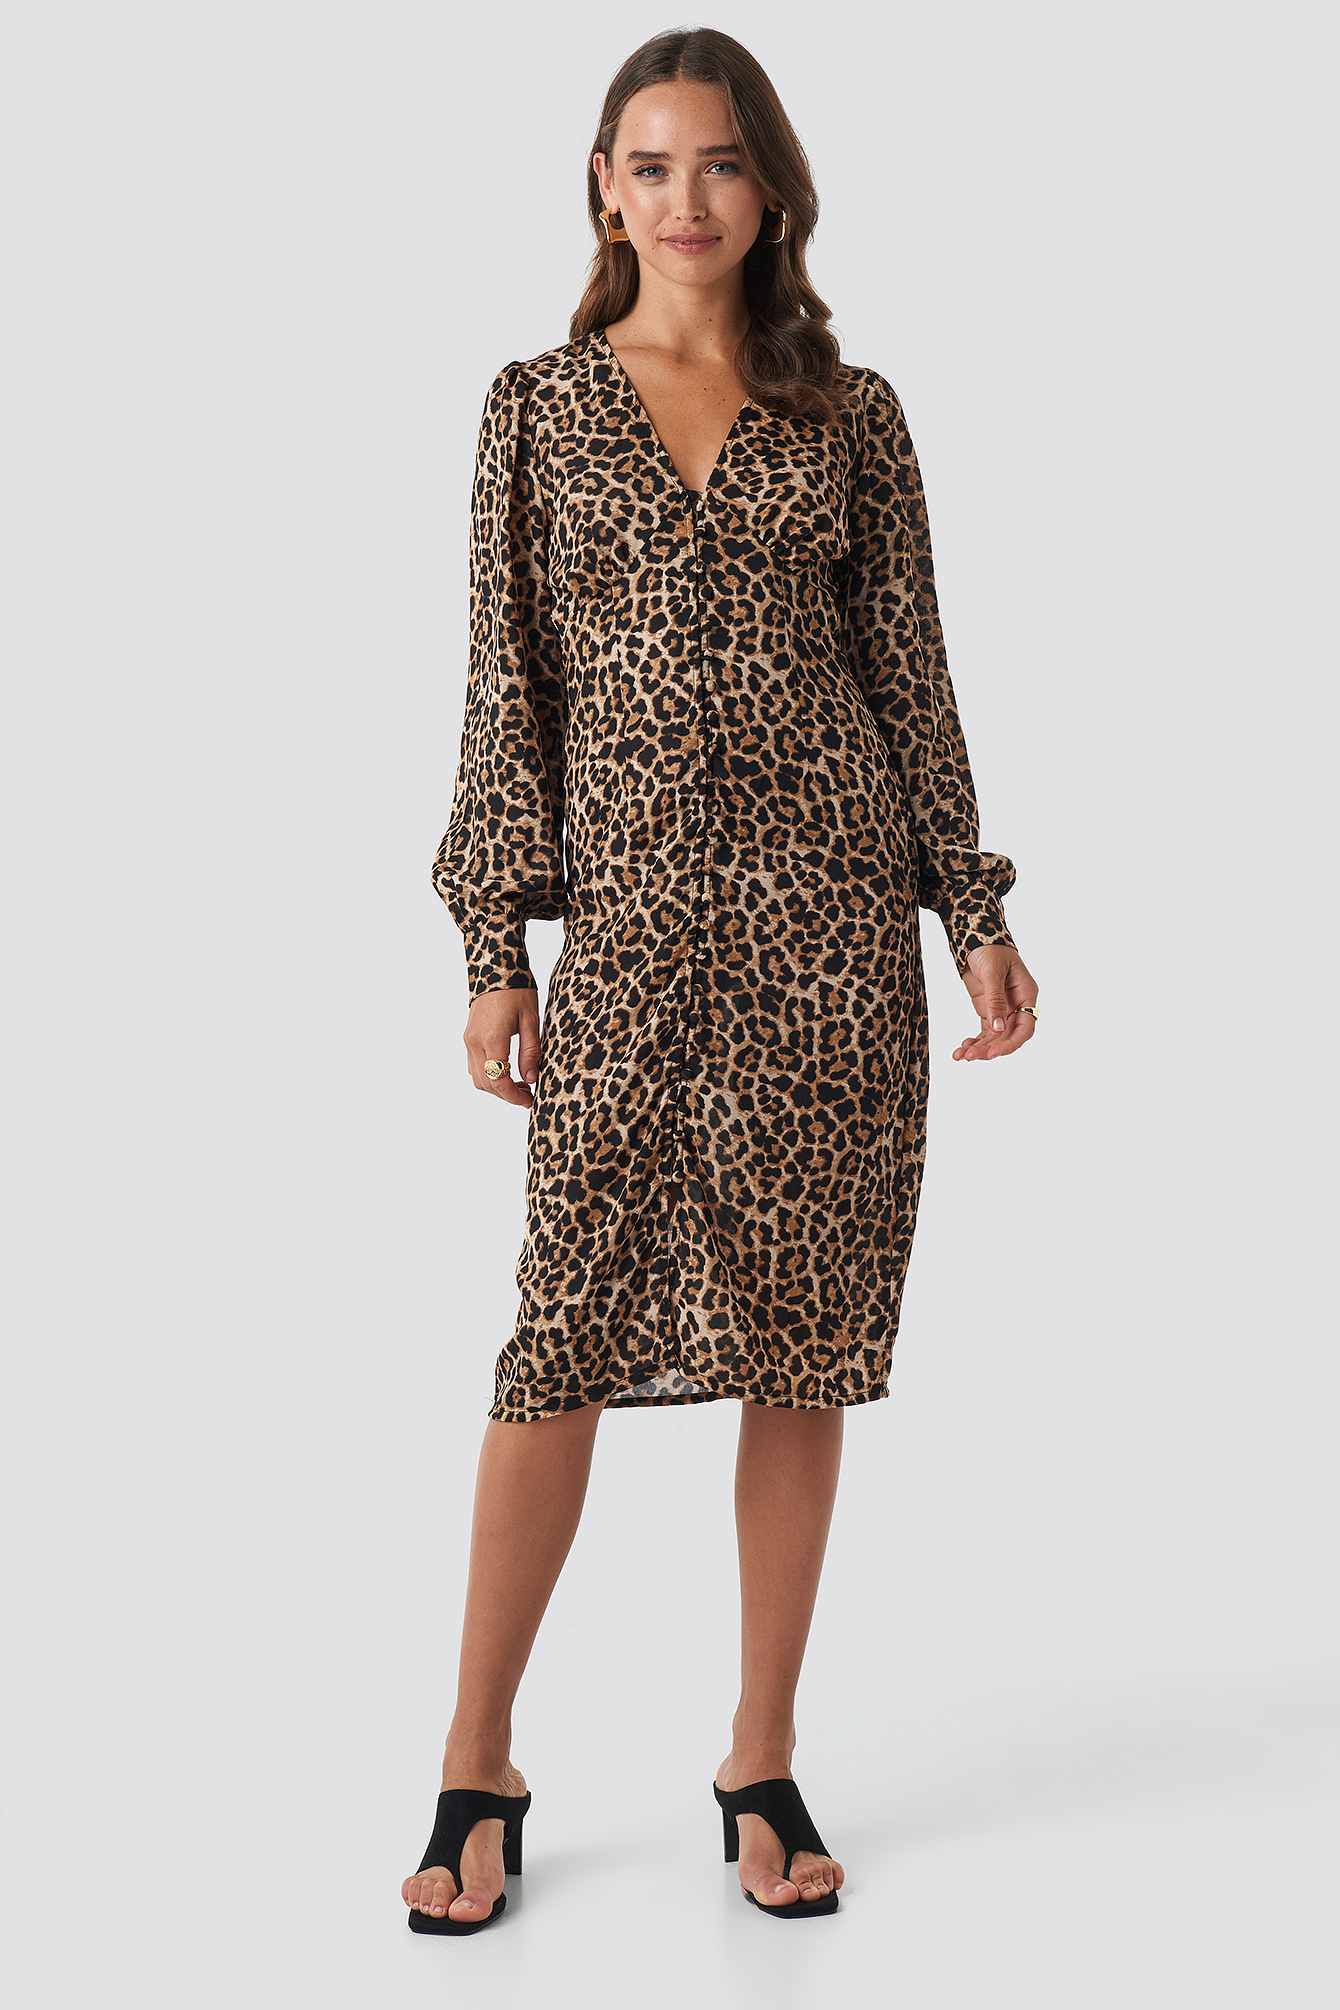 Buttoned Front V-Neck Dress NA-KD.COM